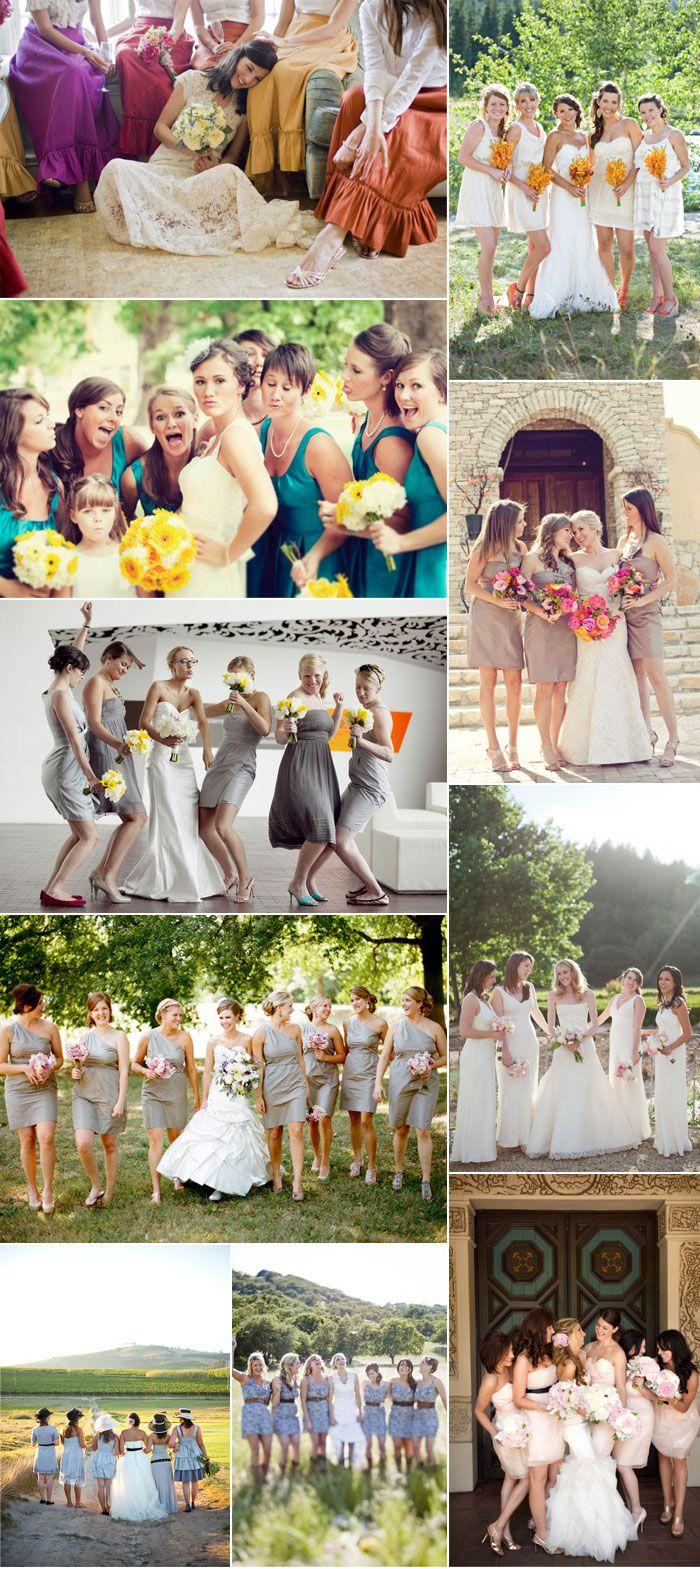 Fun photo and bridesmaid dress inspiration!